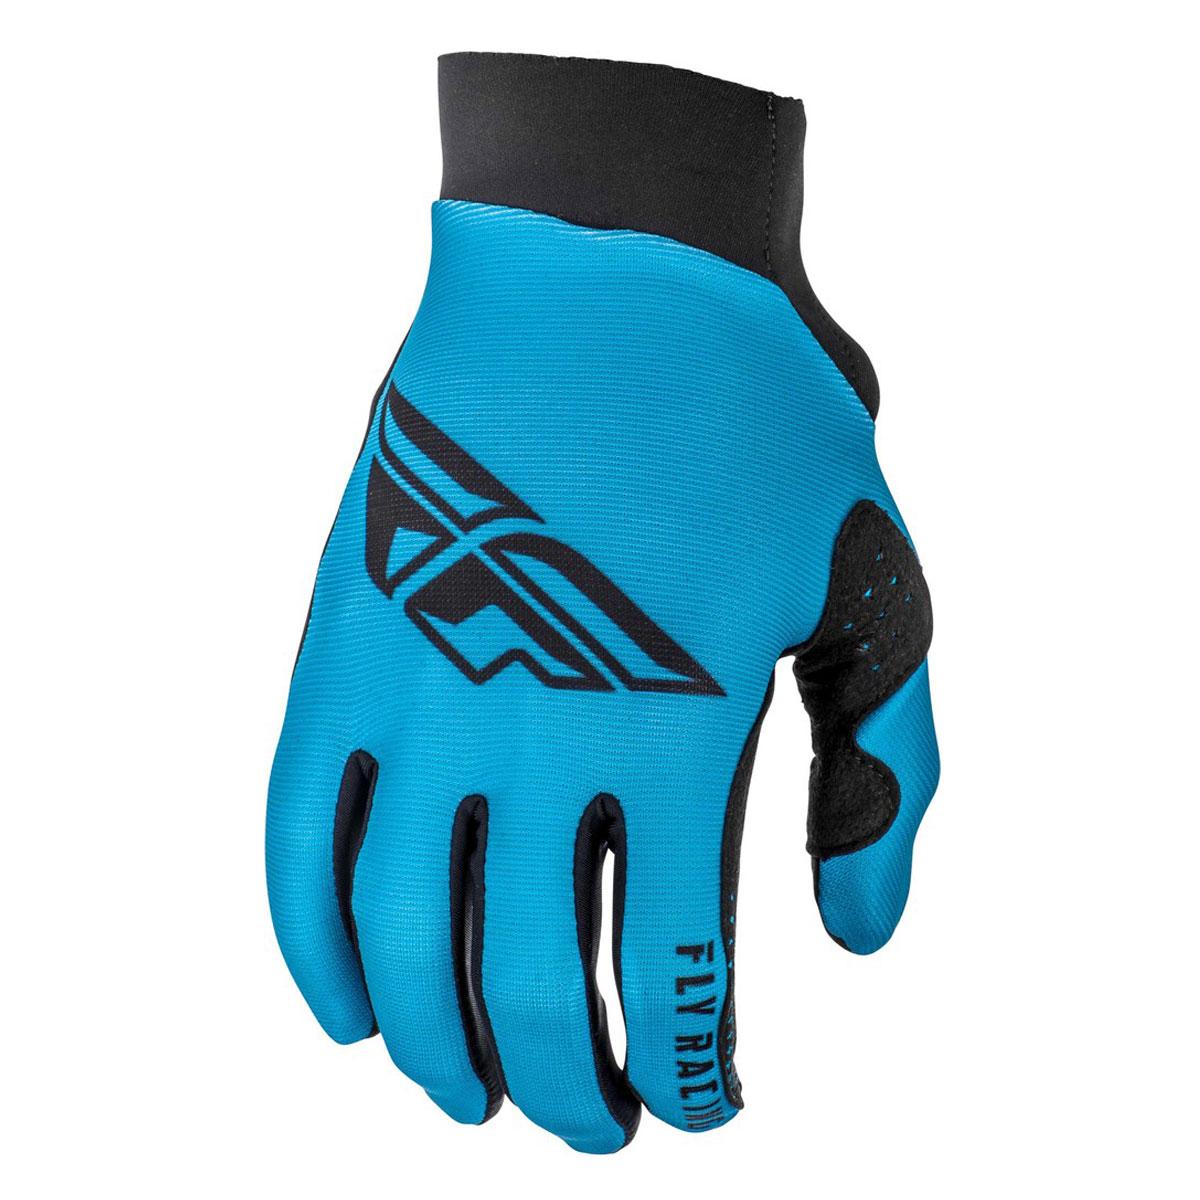 FLY Racing Gloves 2016 Lite RED Motocross Enduro MTB SMALL-XXLARGE